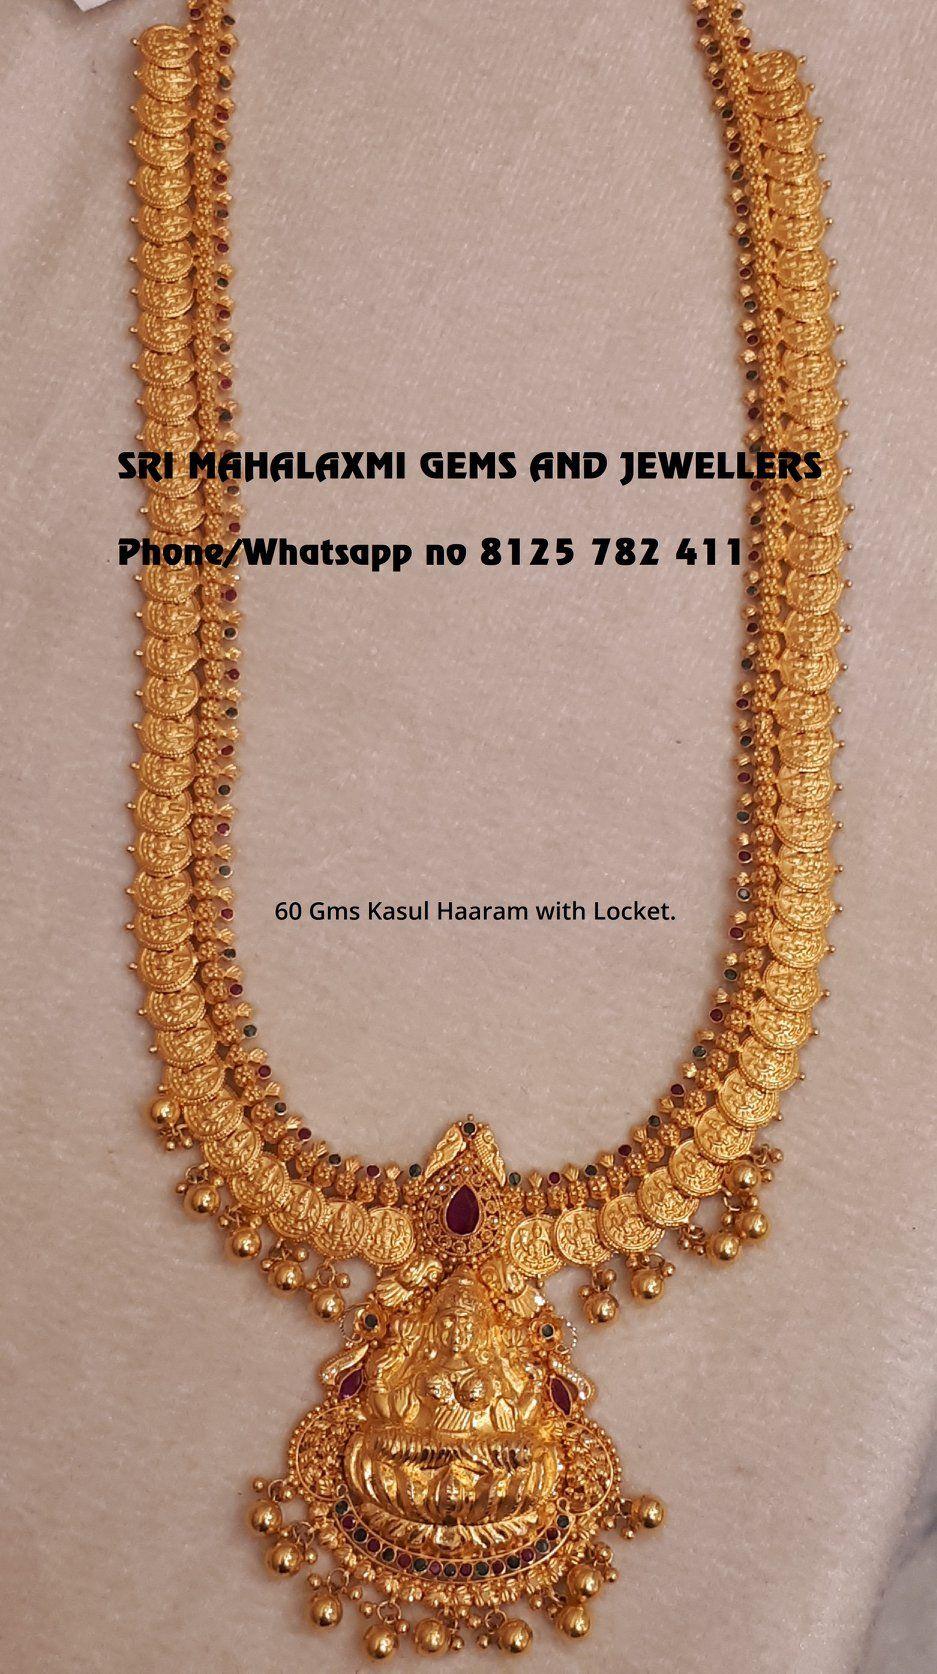 72028c0733f69 Sri Mahalaxmi Gems and Jewellers. Contact :092468 89611. Email ...